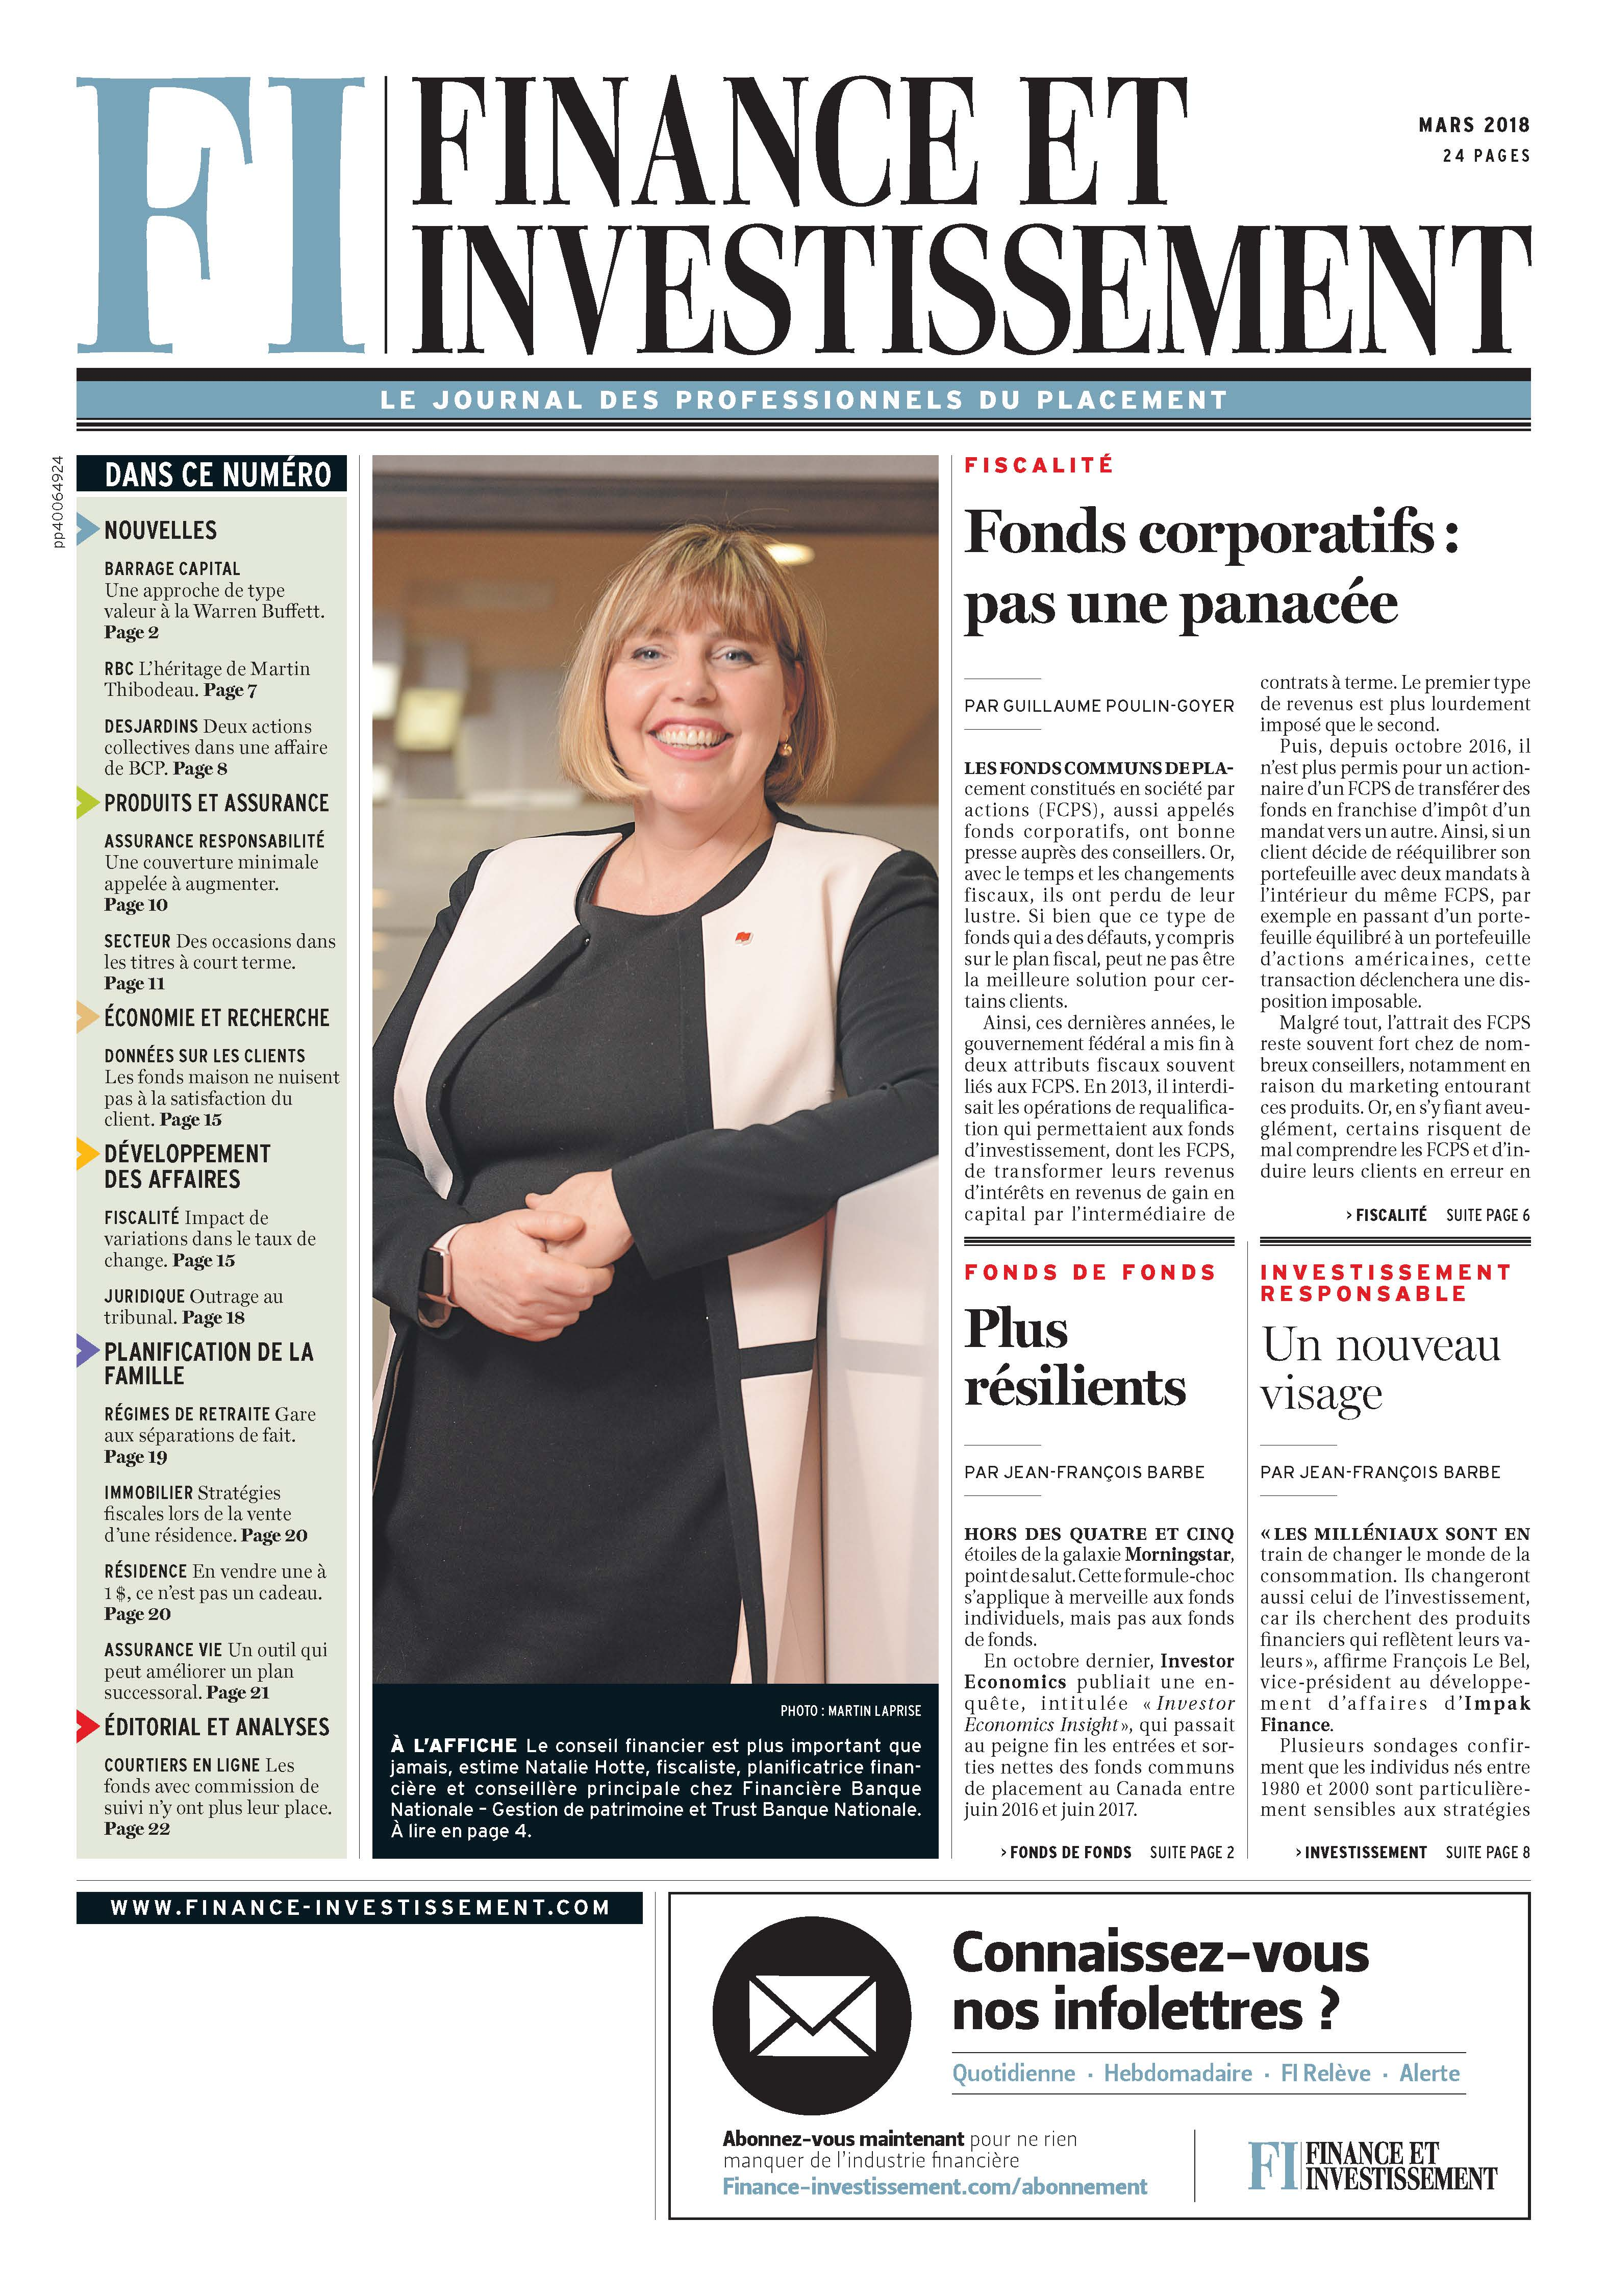 Finance et Investissement – 1 mars 2018